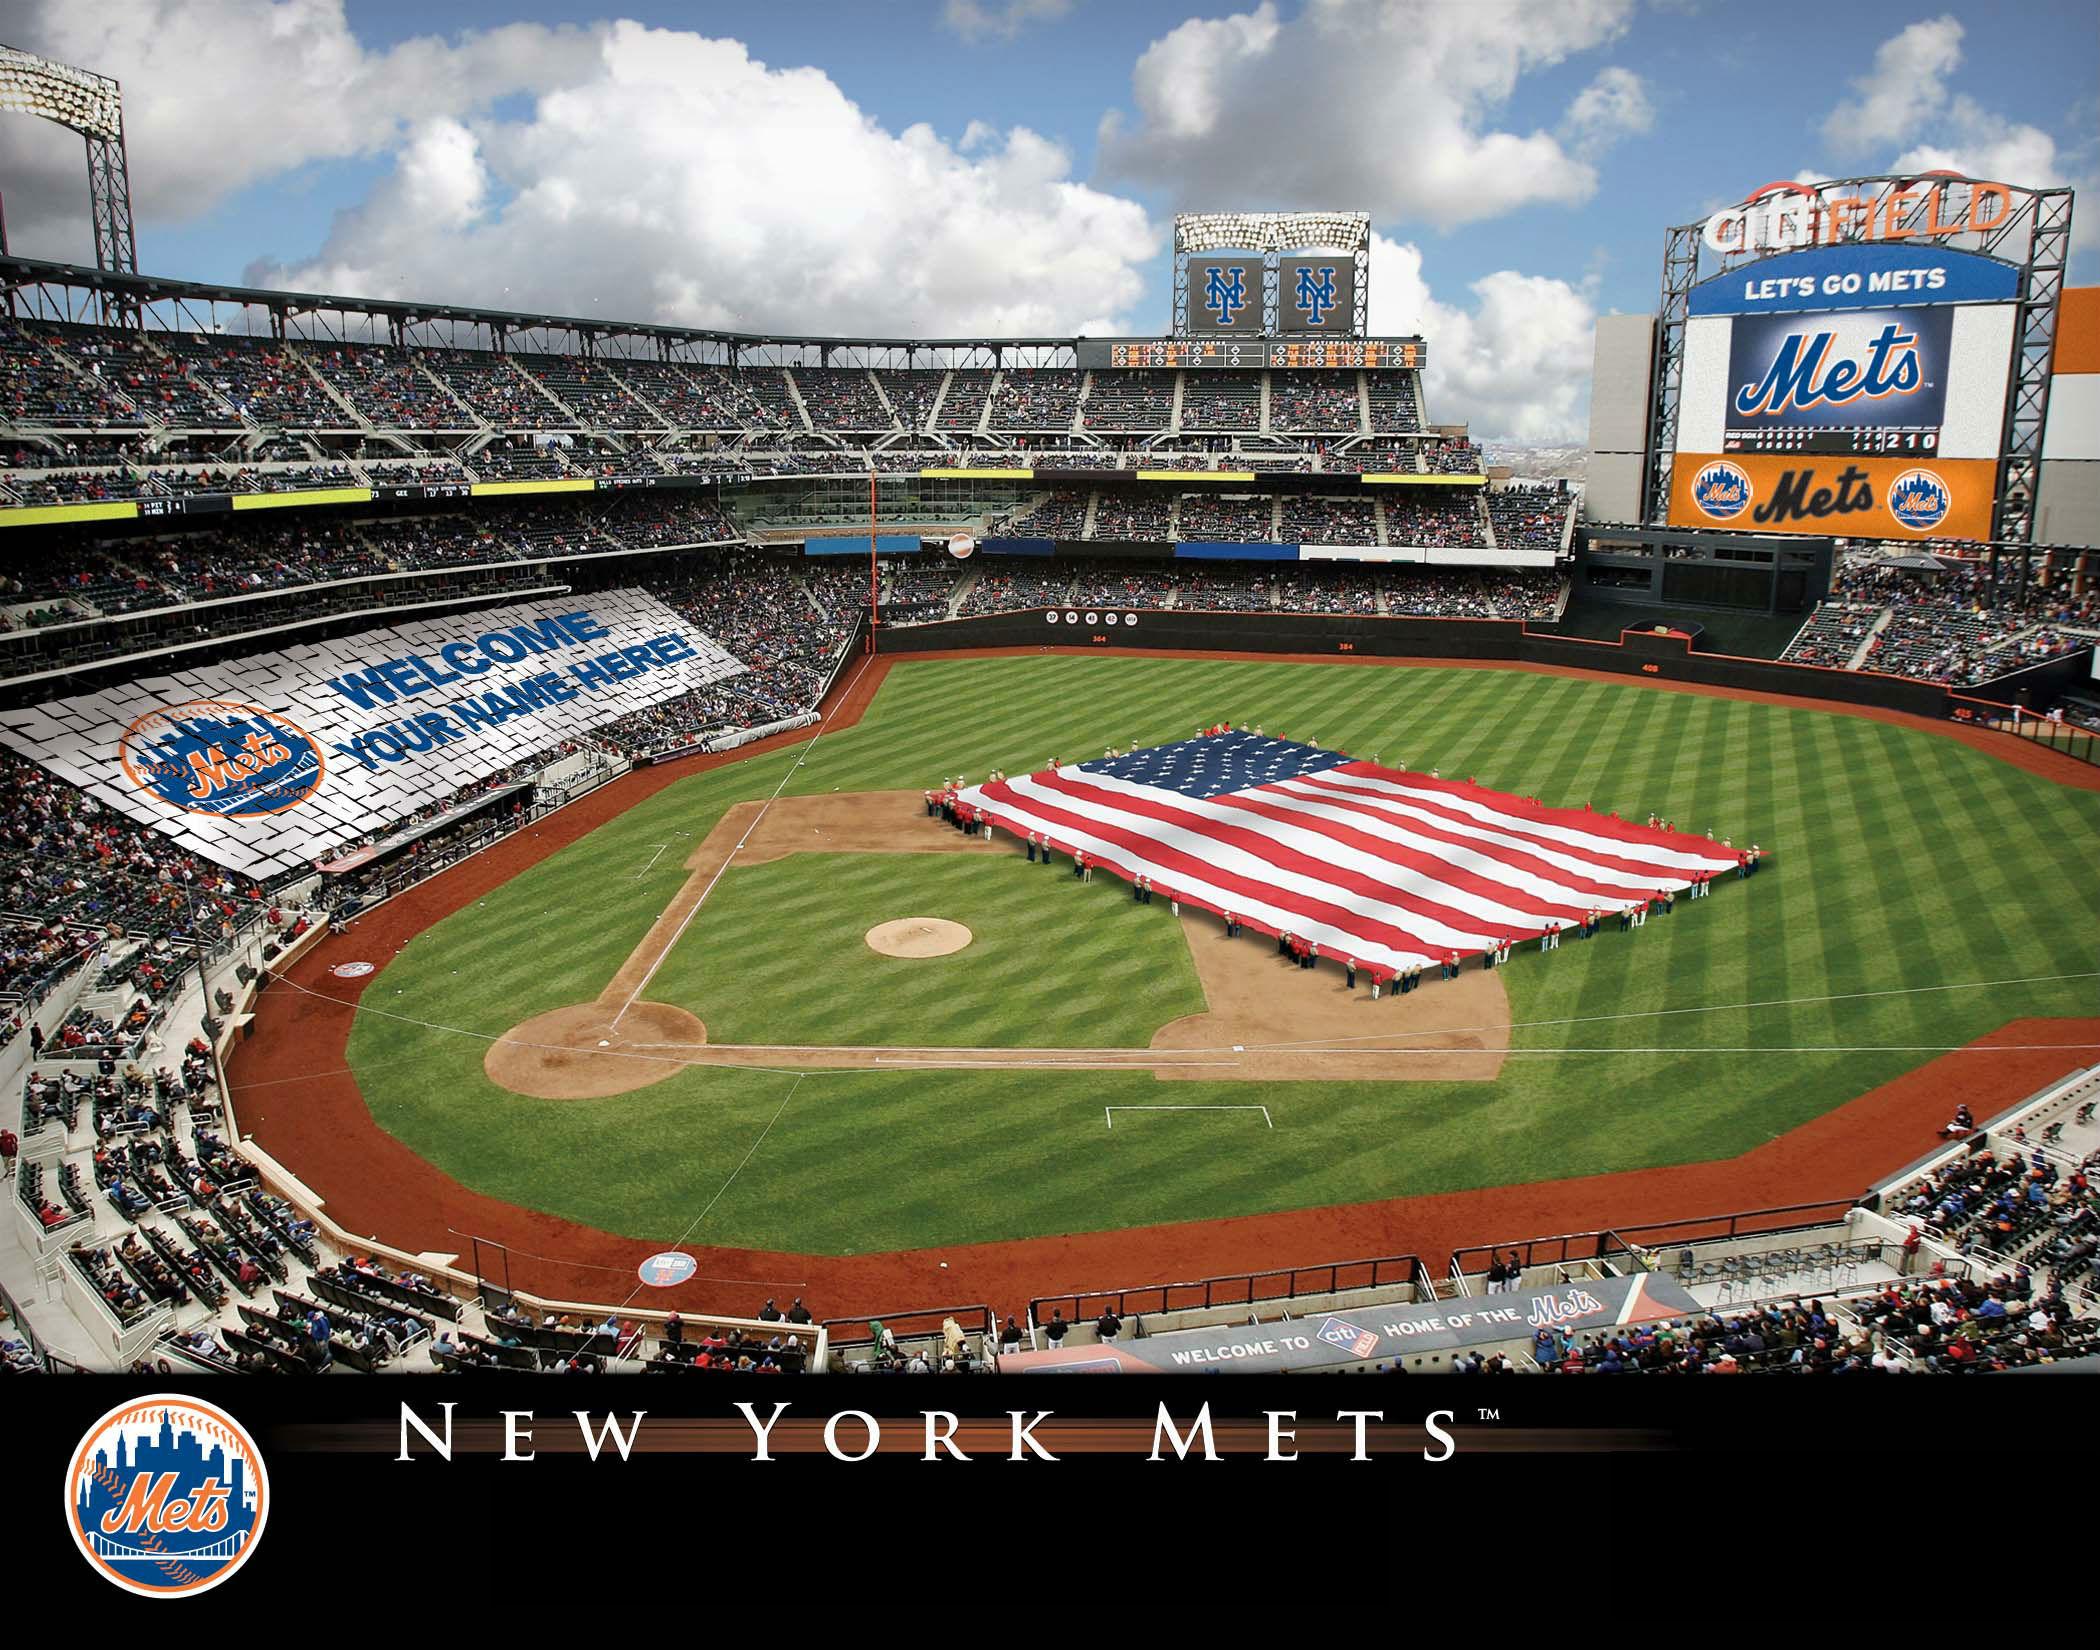 NEW YORK METS baseball mlb 13 wallpaper 2100x1650 232323 2100x1650